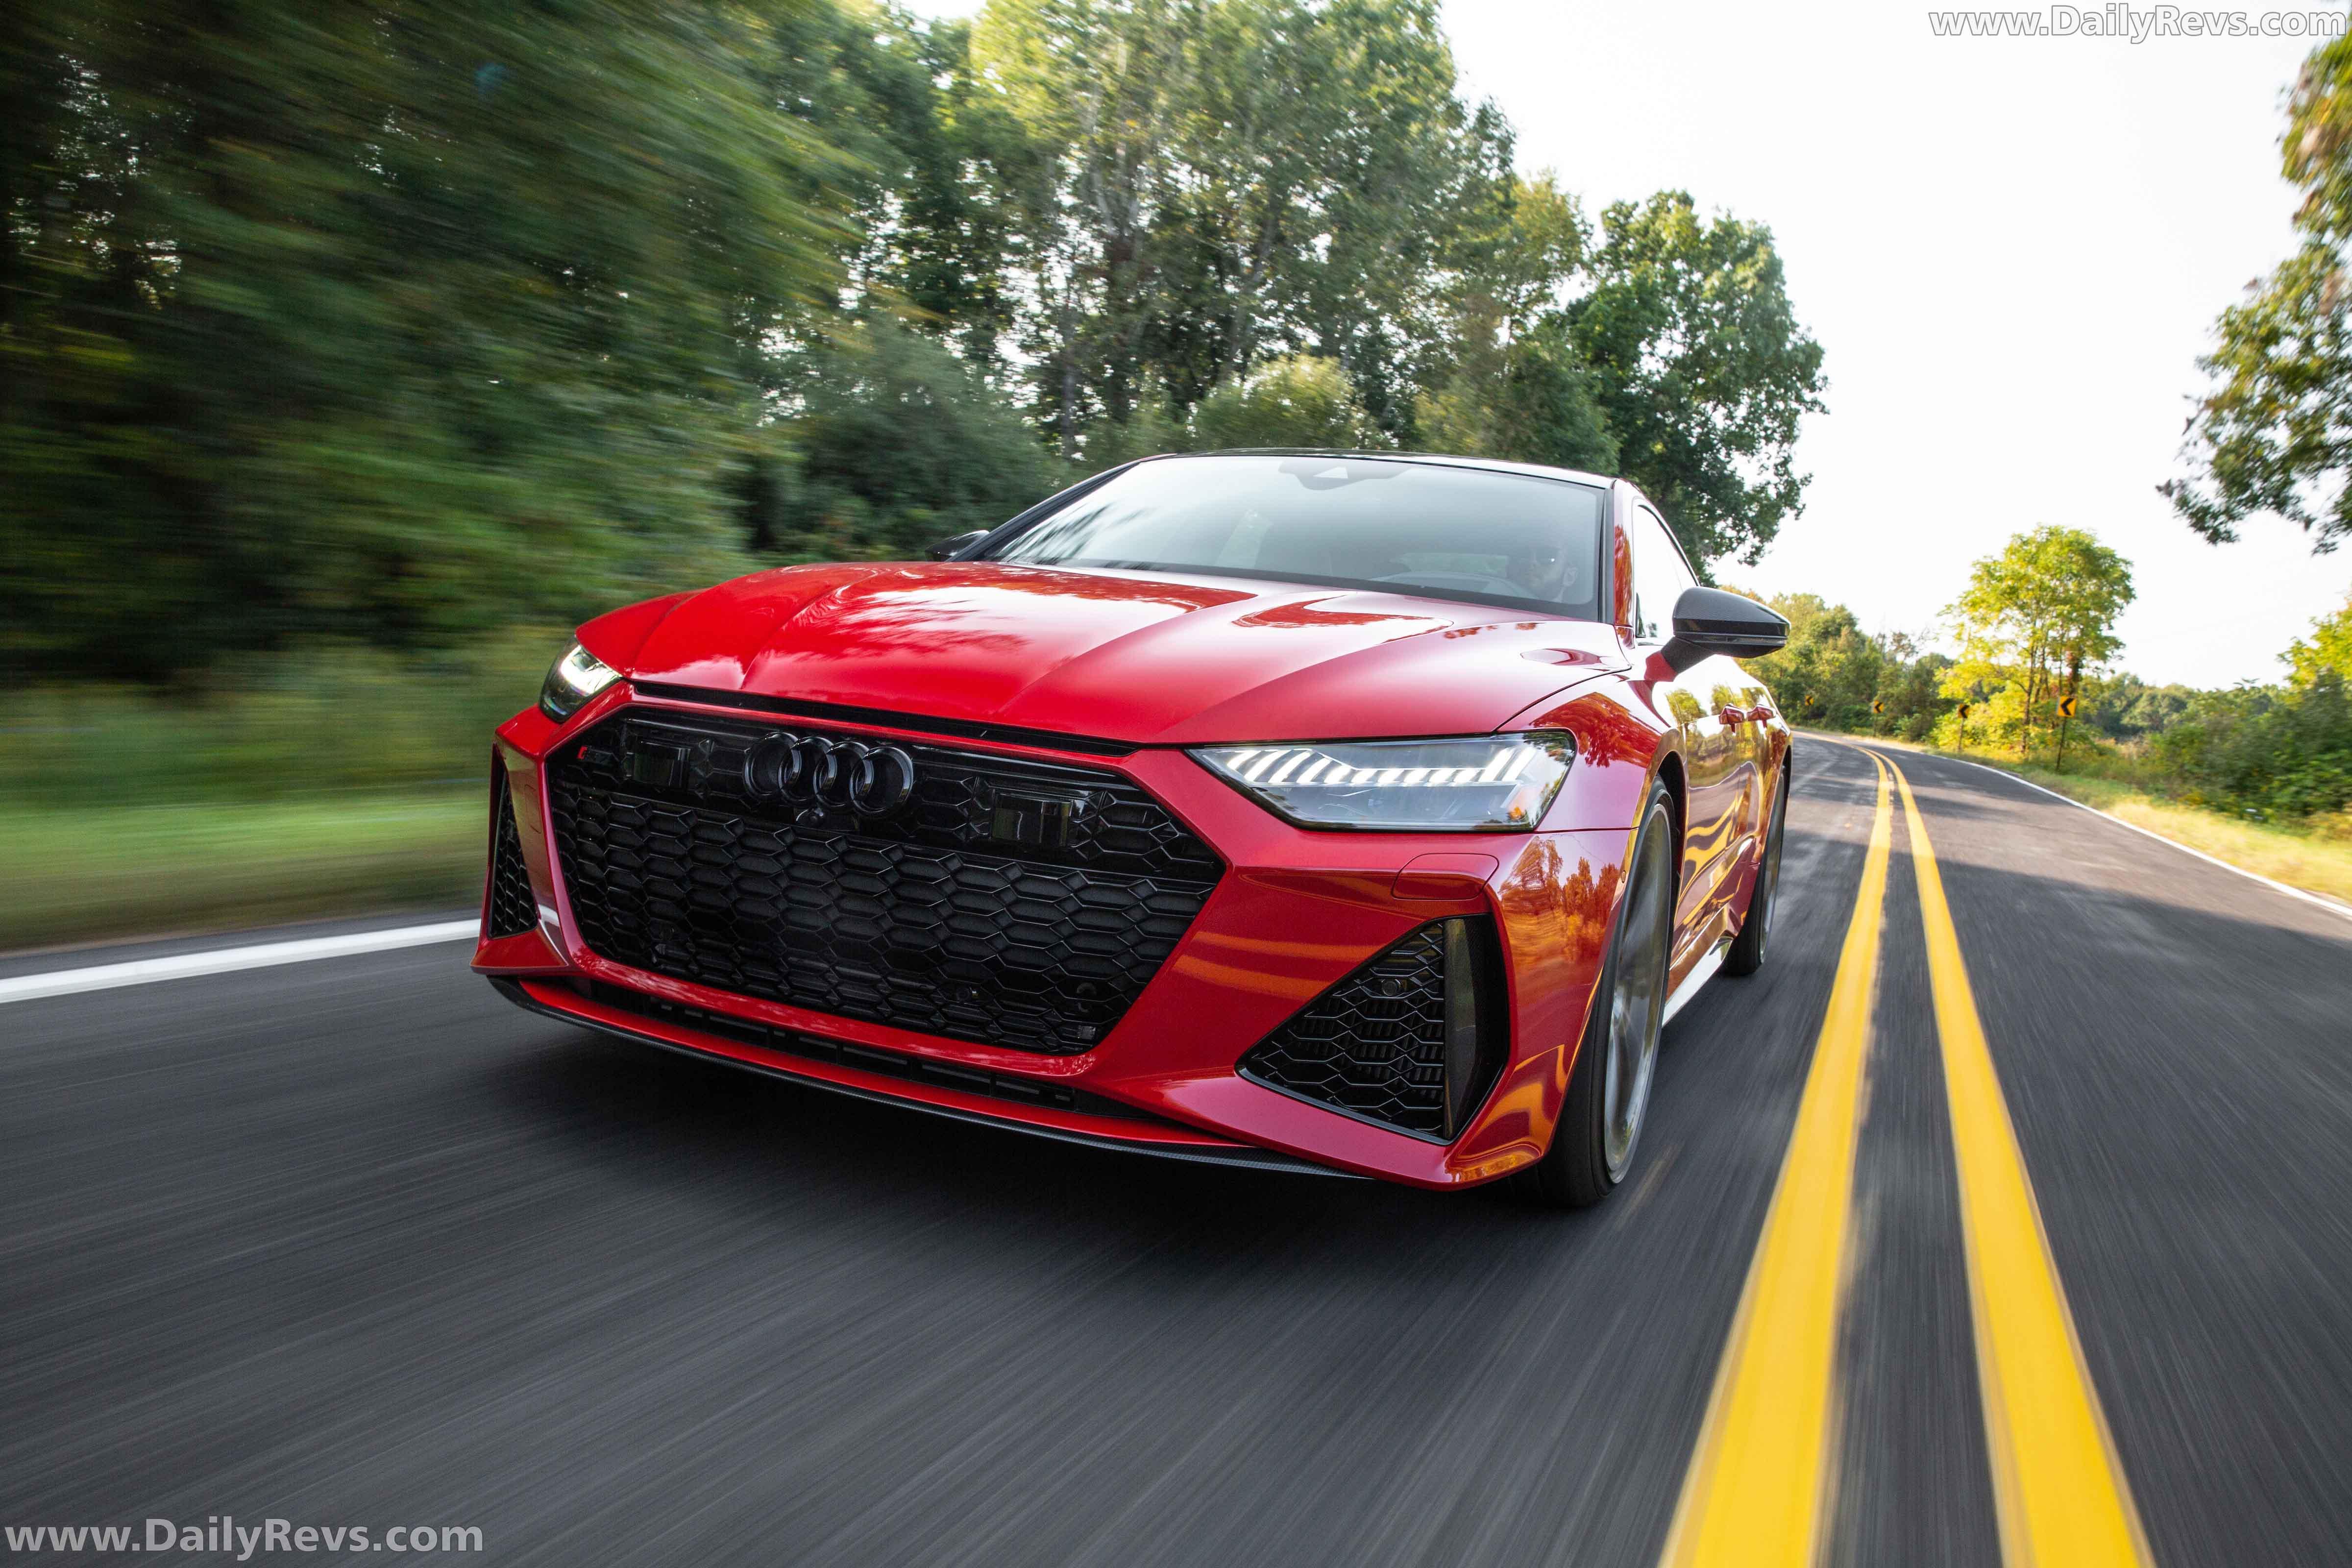 2021 Audi RS7 Sportback - US Version - Dailyrevs